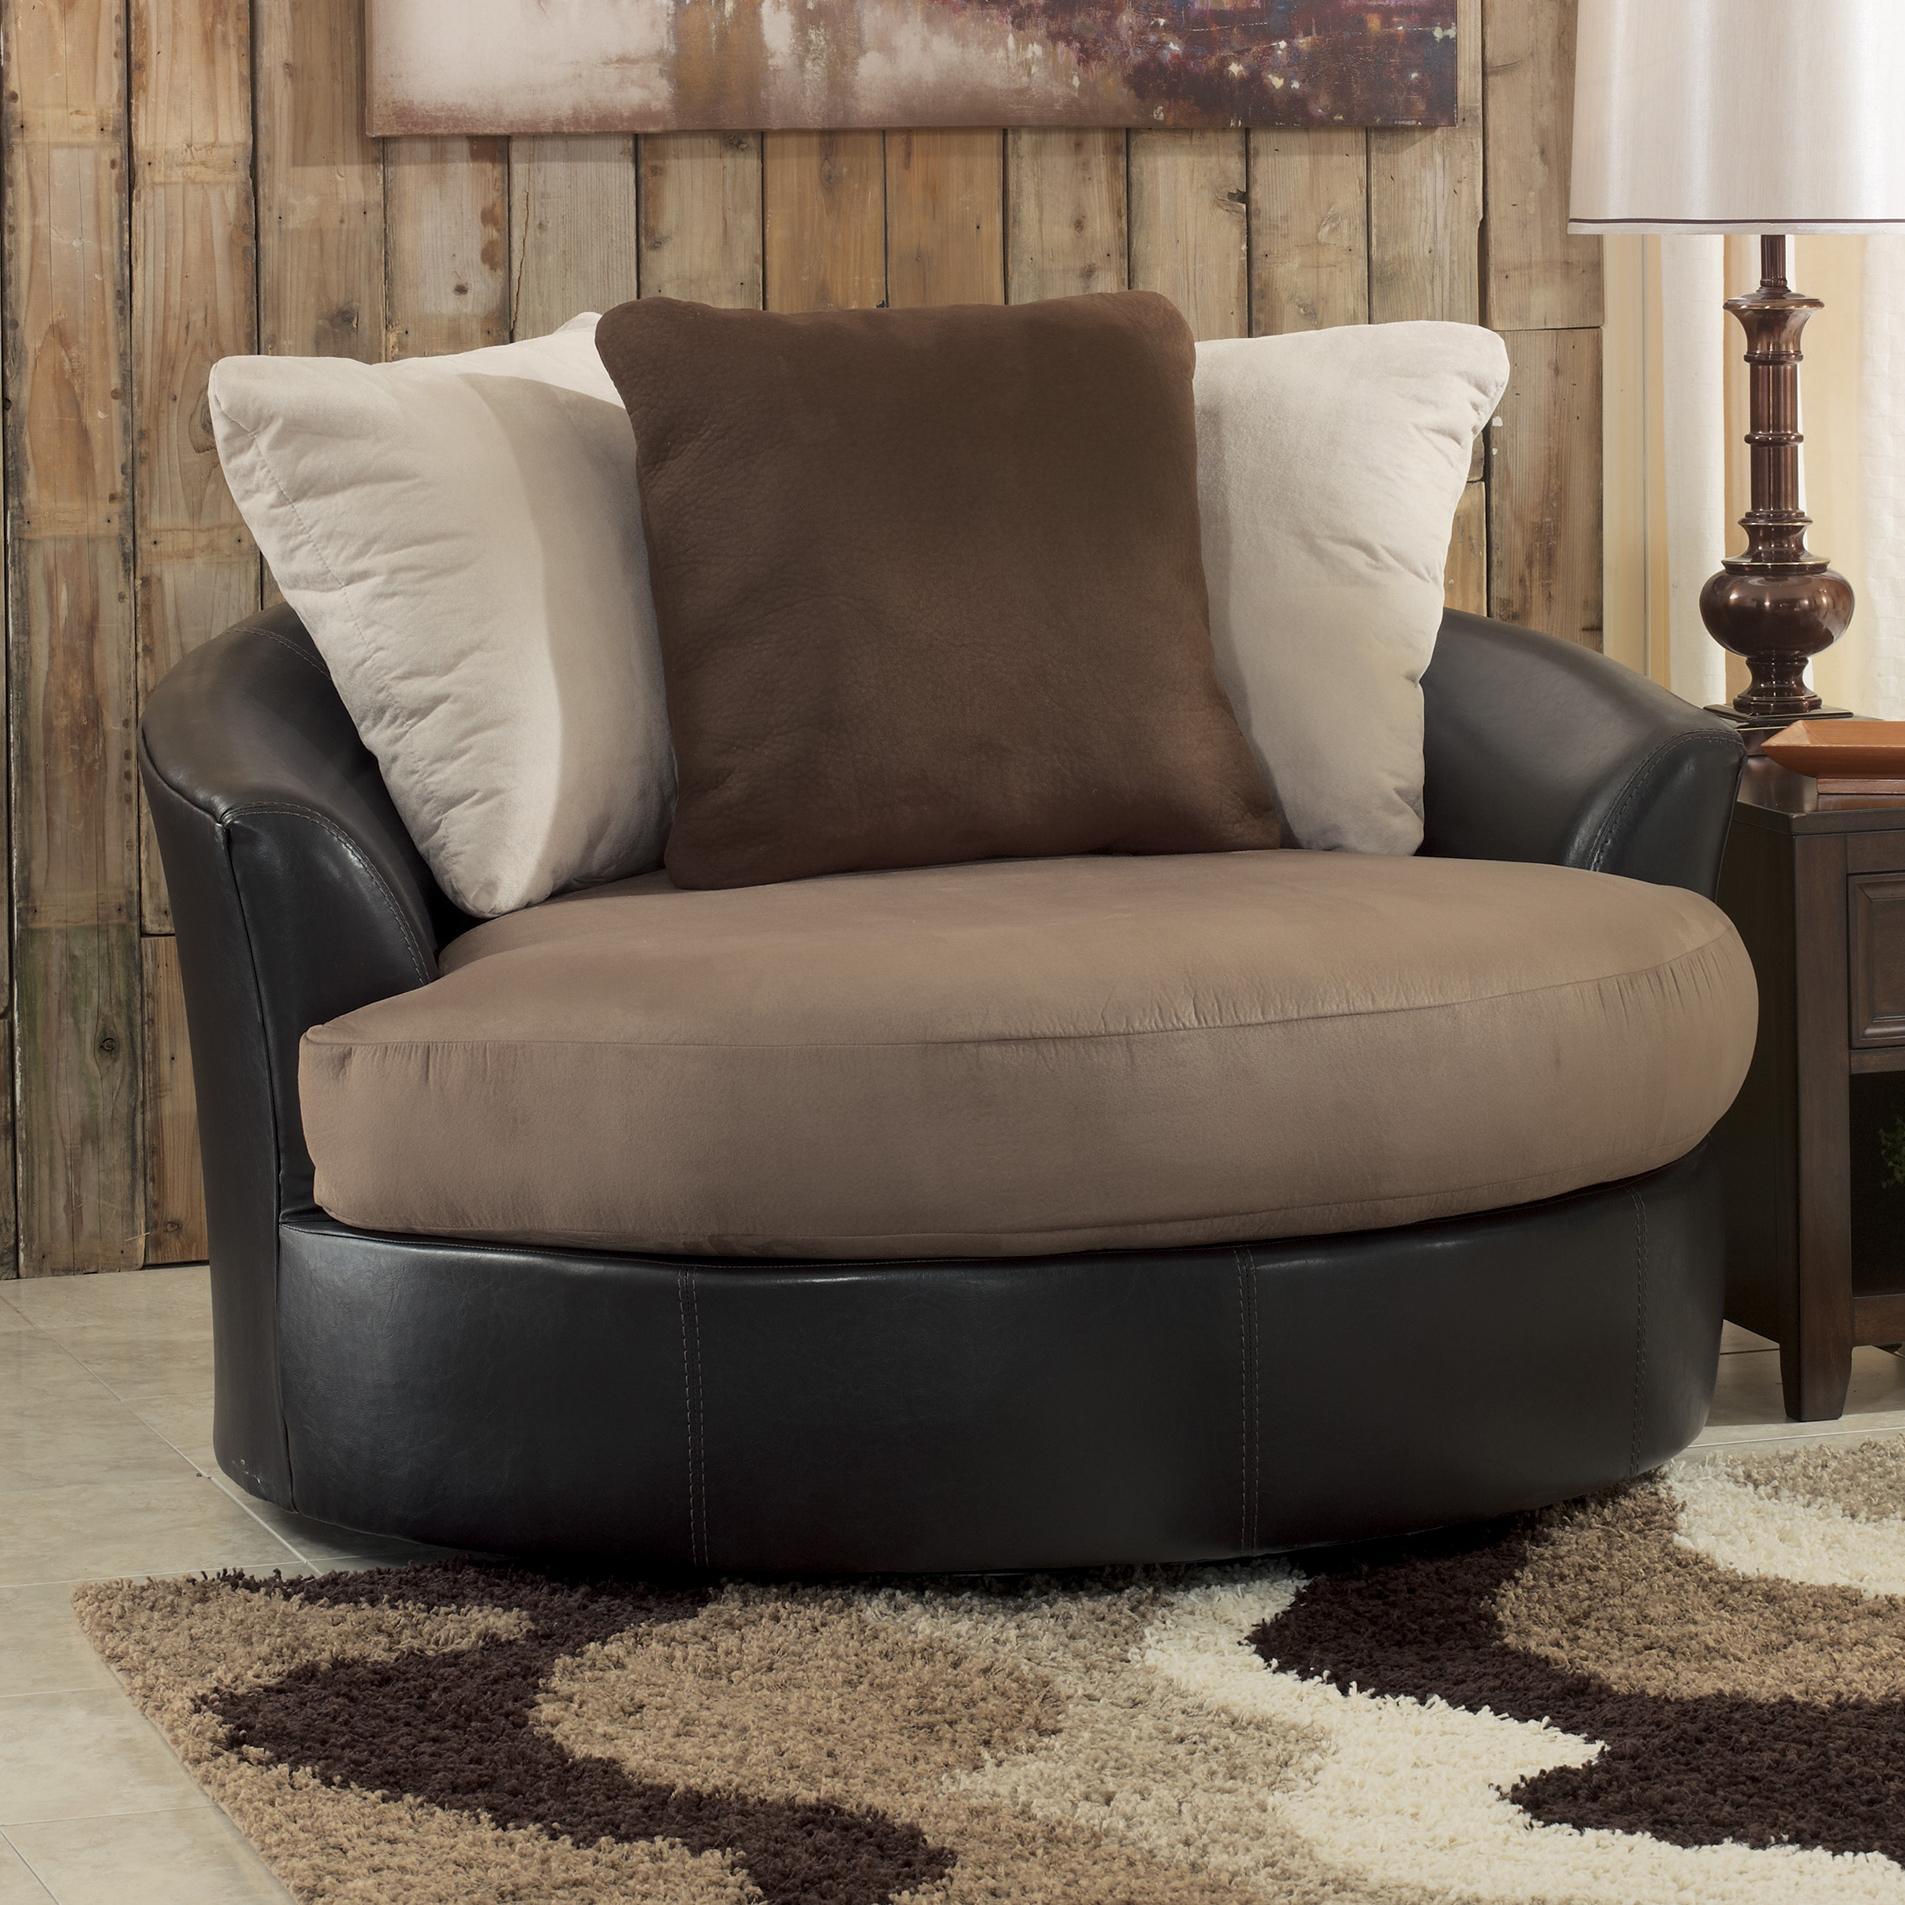 Living Room Oversized Chairs Benchcraft Masoli Mocha Oversized Swivel Accent Chair Wayside